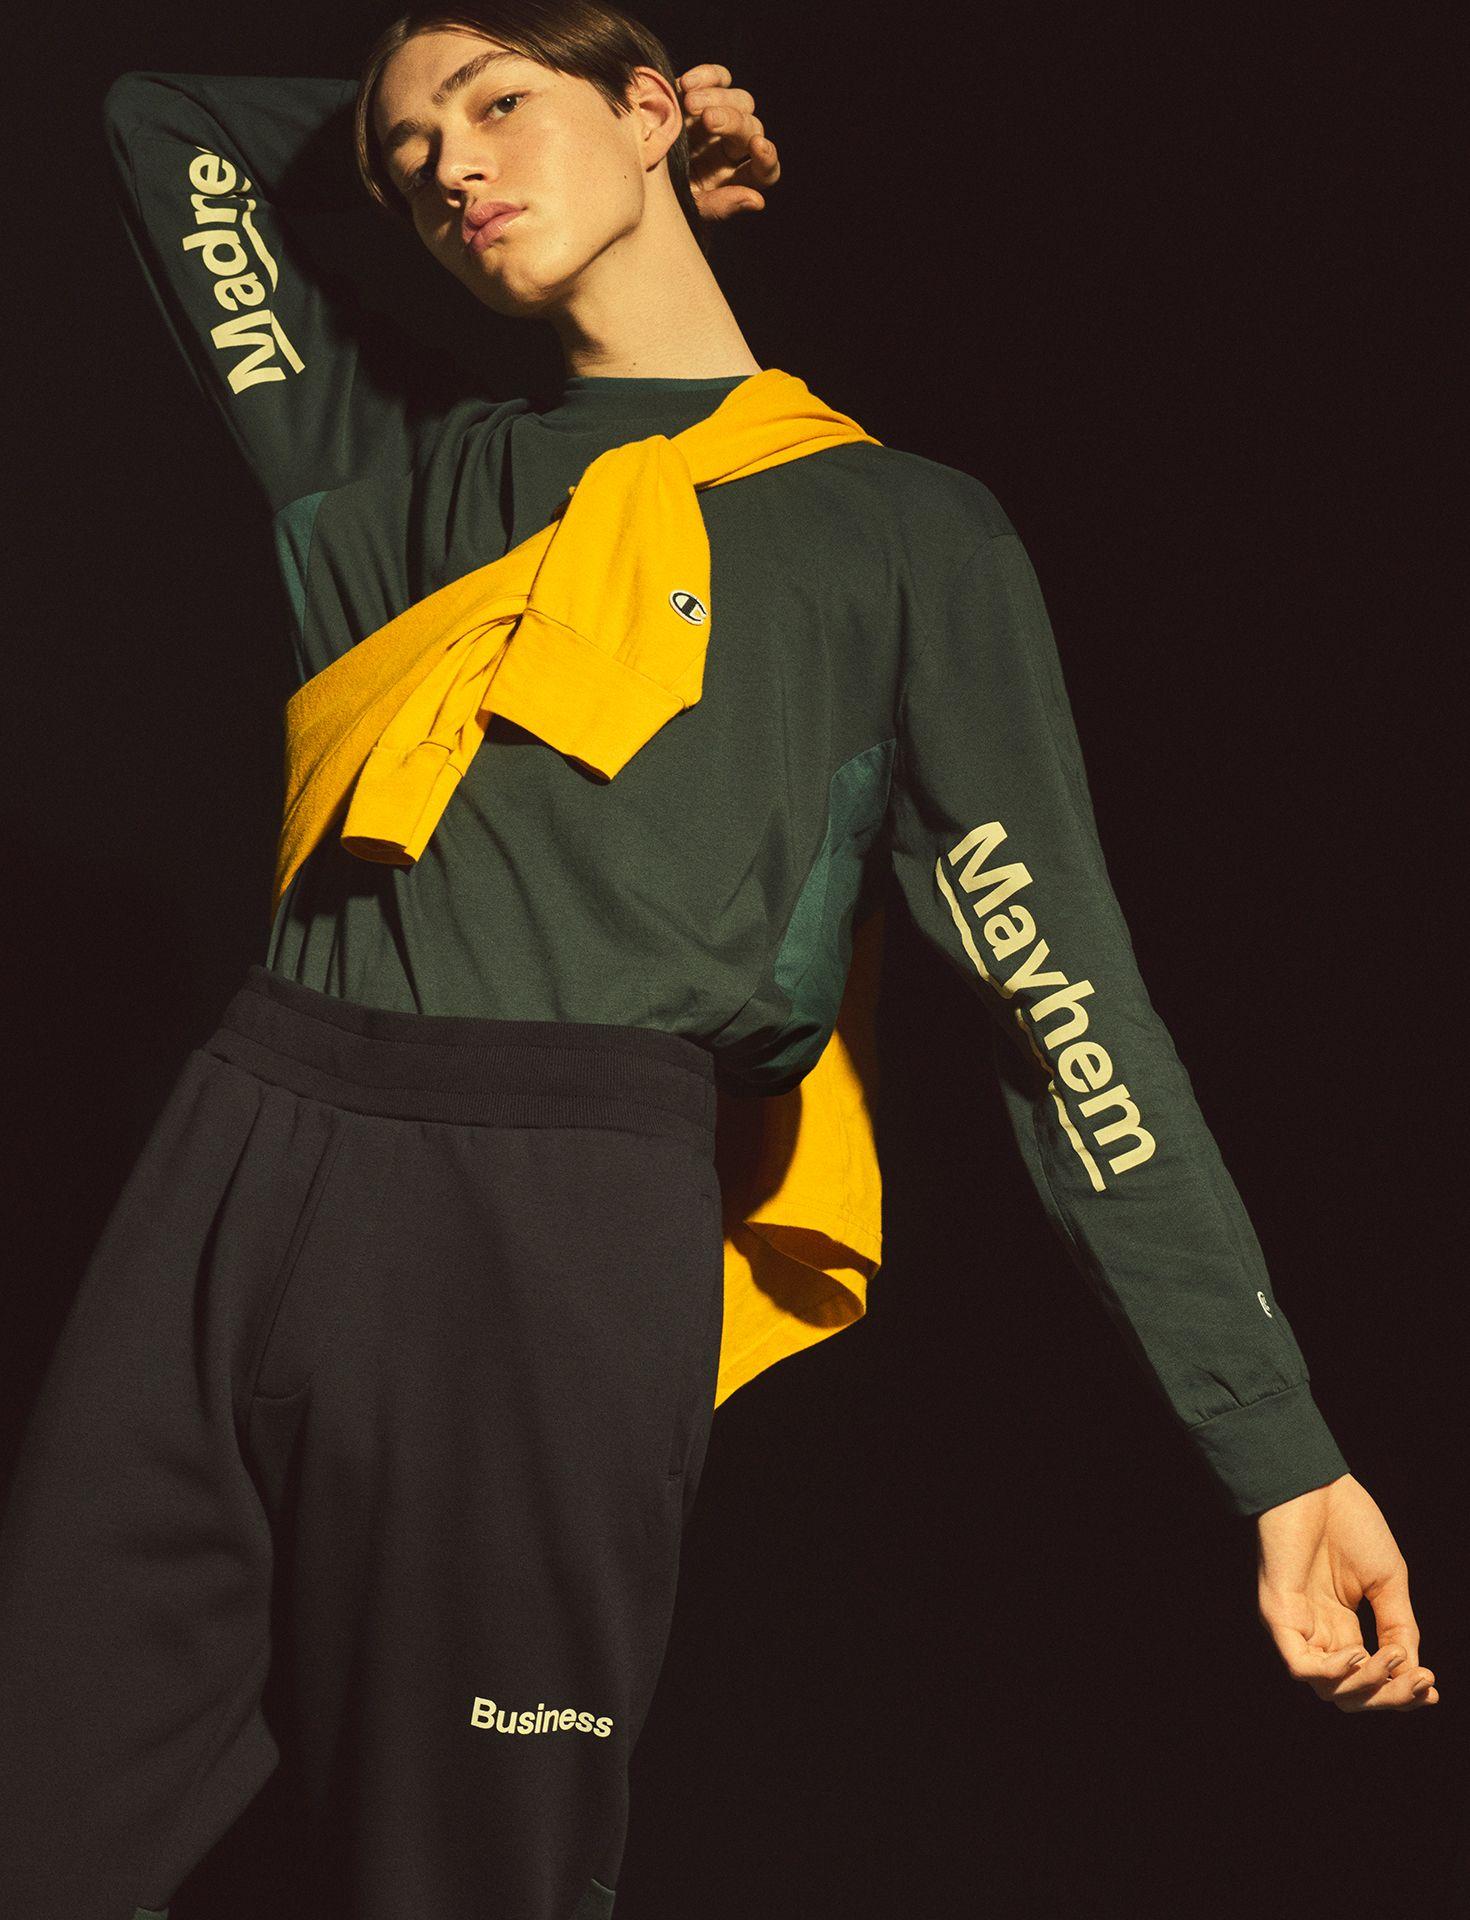 e00498f06 ... of WOOD WOOD and classic American sportswear brand Champion. Streetwear  essentials reimagined. Shop online. #champion #woodwood #fashion #streetwear